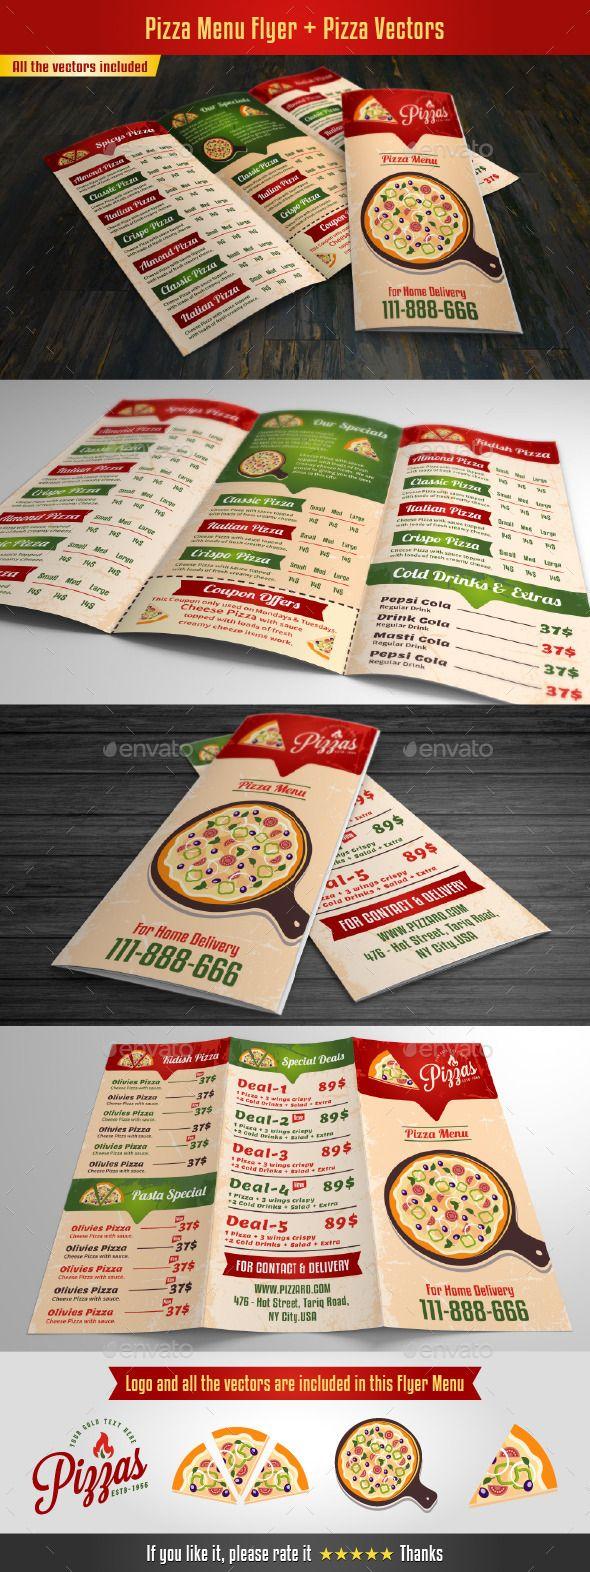 Pizza Menu Flyer | Pinterest | Me gustas